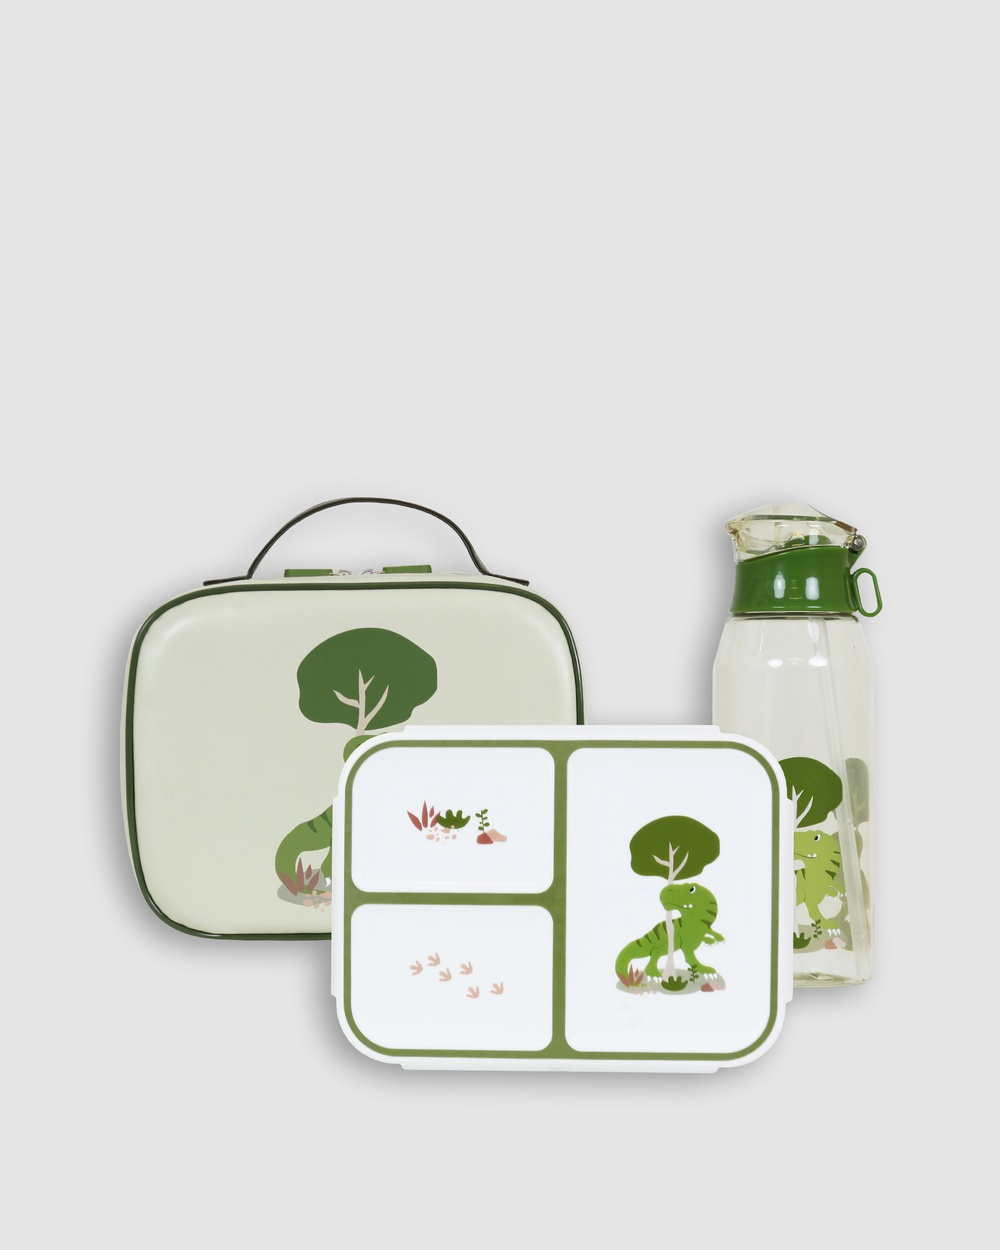 Bobbleart Large Lunch Bag Bento Box and Drink Bottle T Rex Novelty Gifts Light Green T-Rex